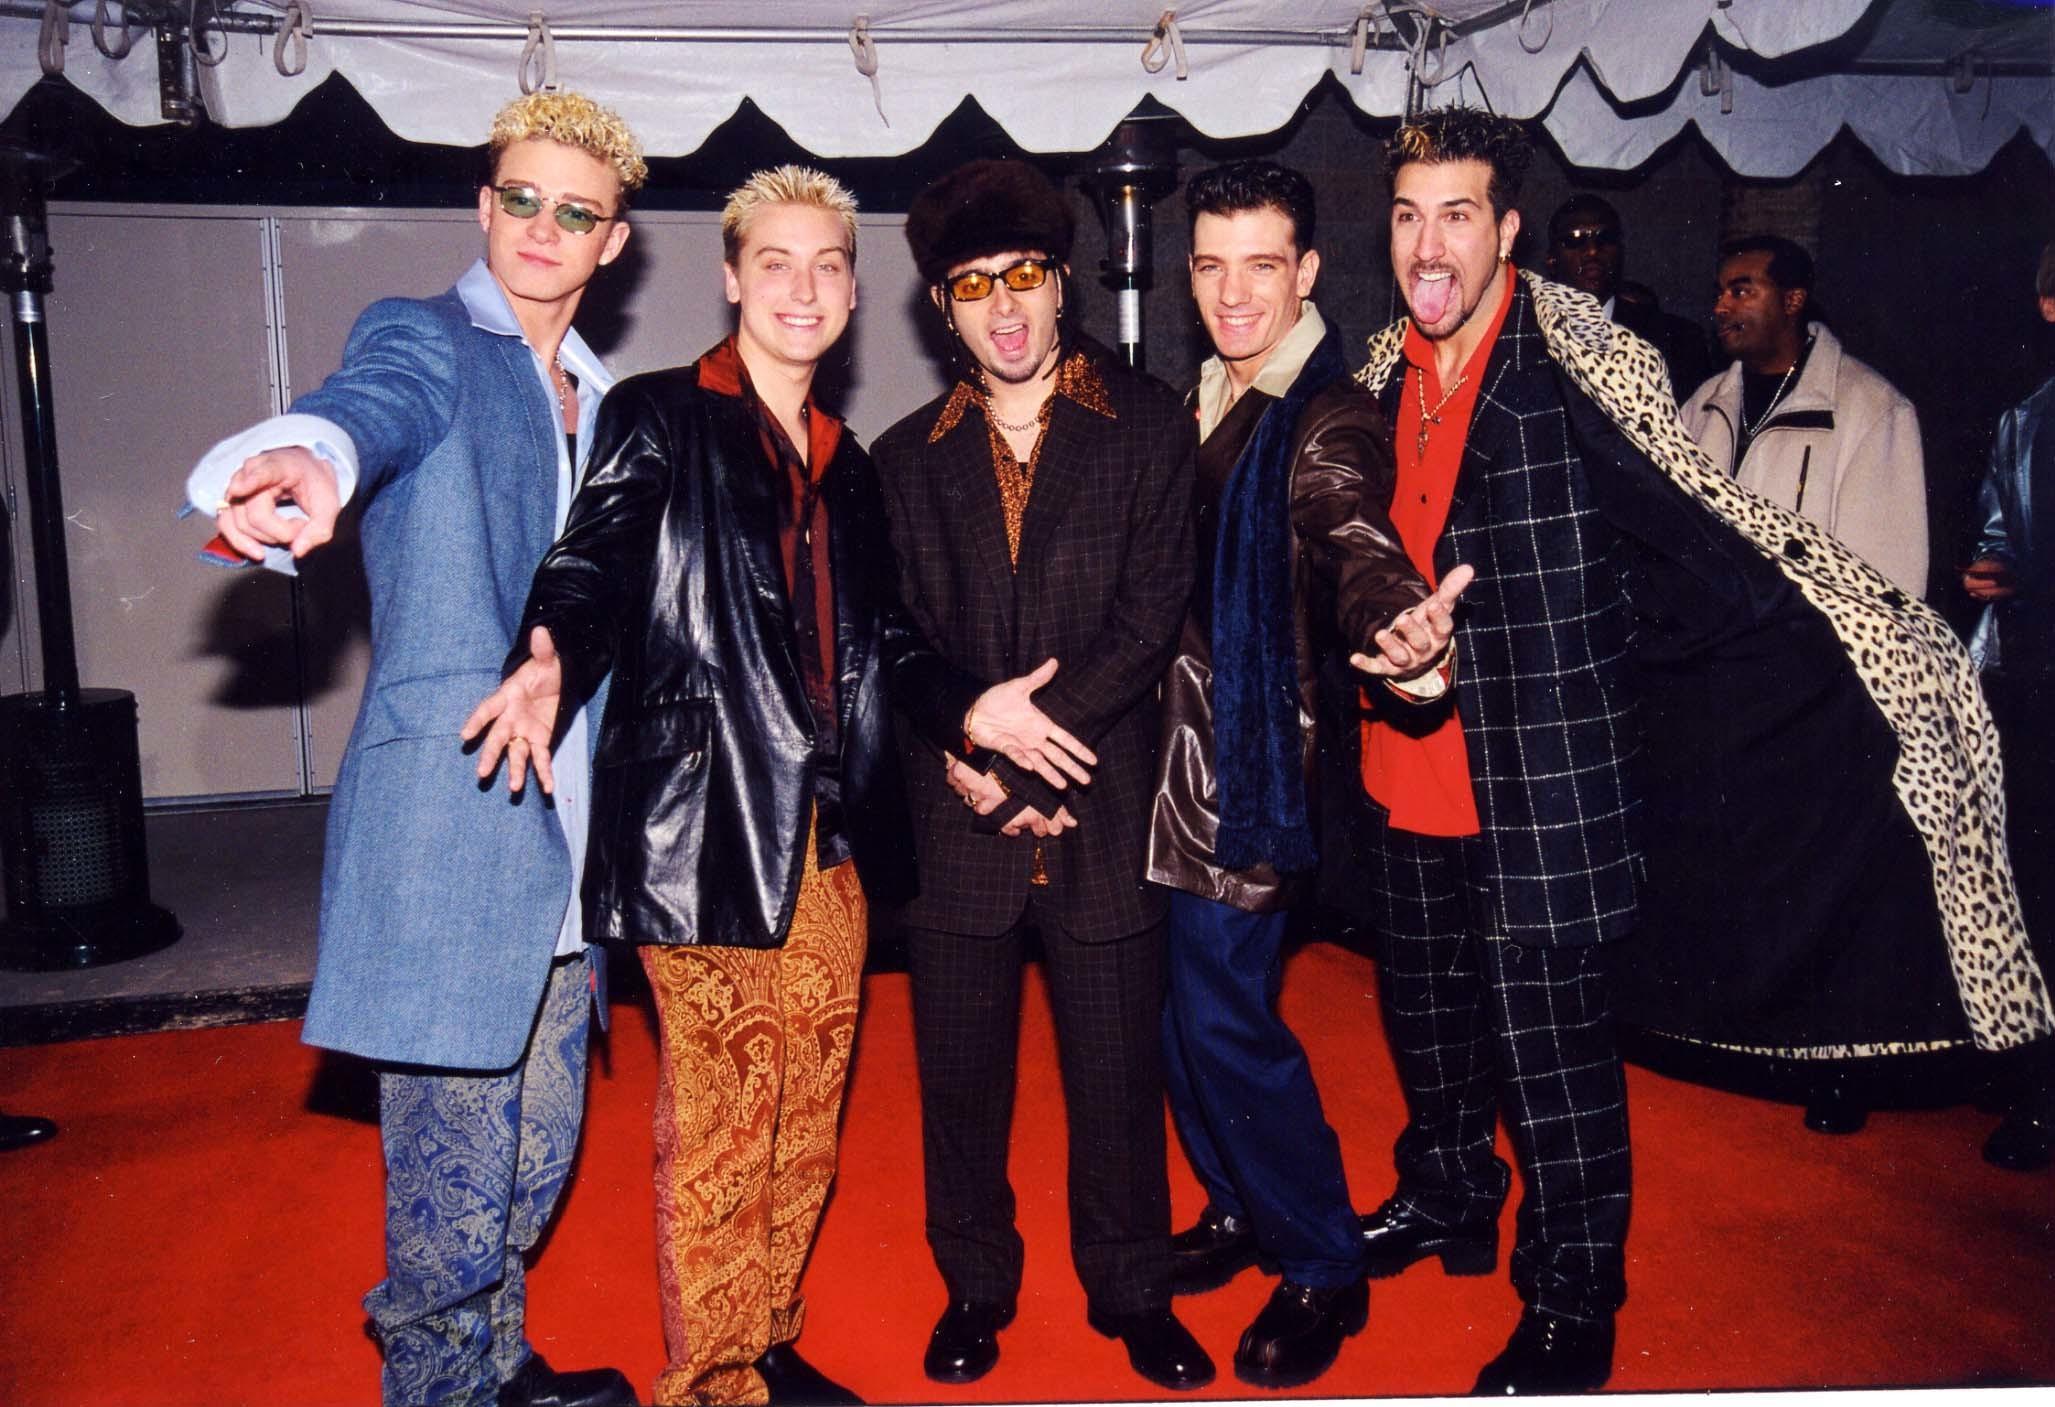 Justin Timberlake, Lance Bass, Chris Kirkpatrick, JC Chasez and Joey Fatone of *NSYNC attend the Billboard Awards at MGM Grand Hotel/Casino in Las Vegas on Dec. 7, 1998.